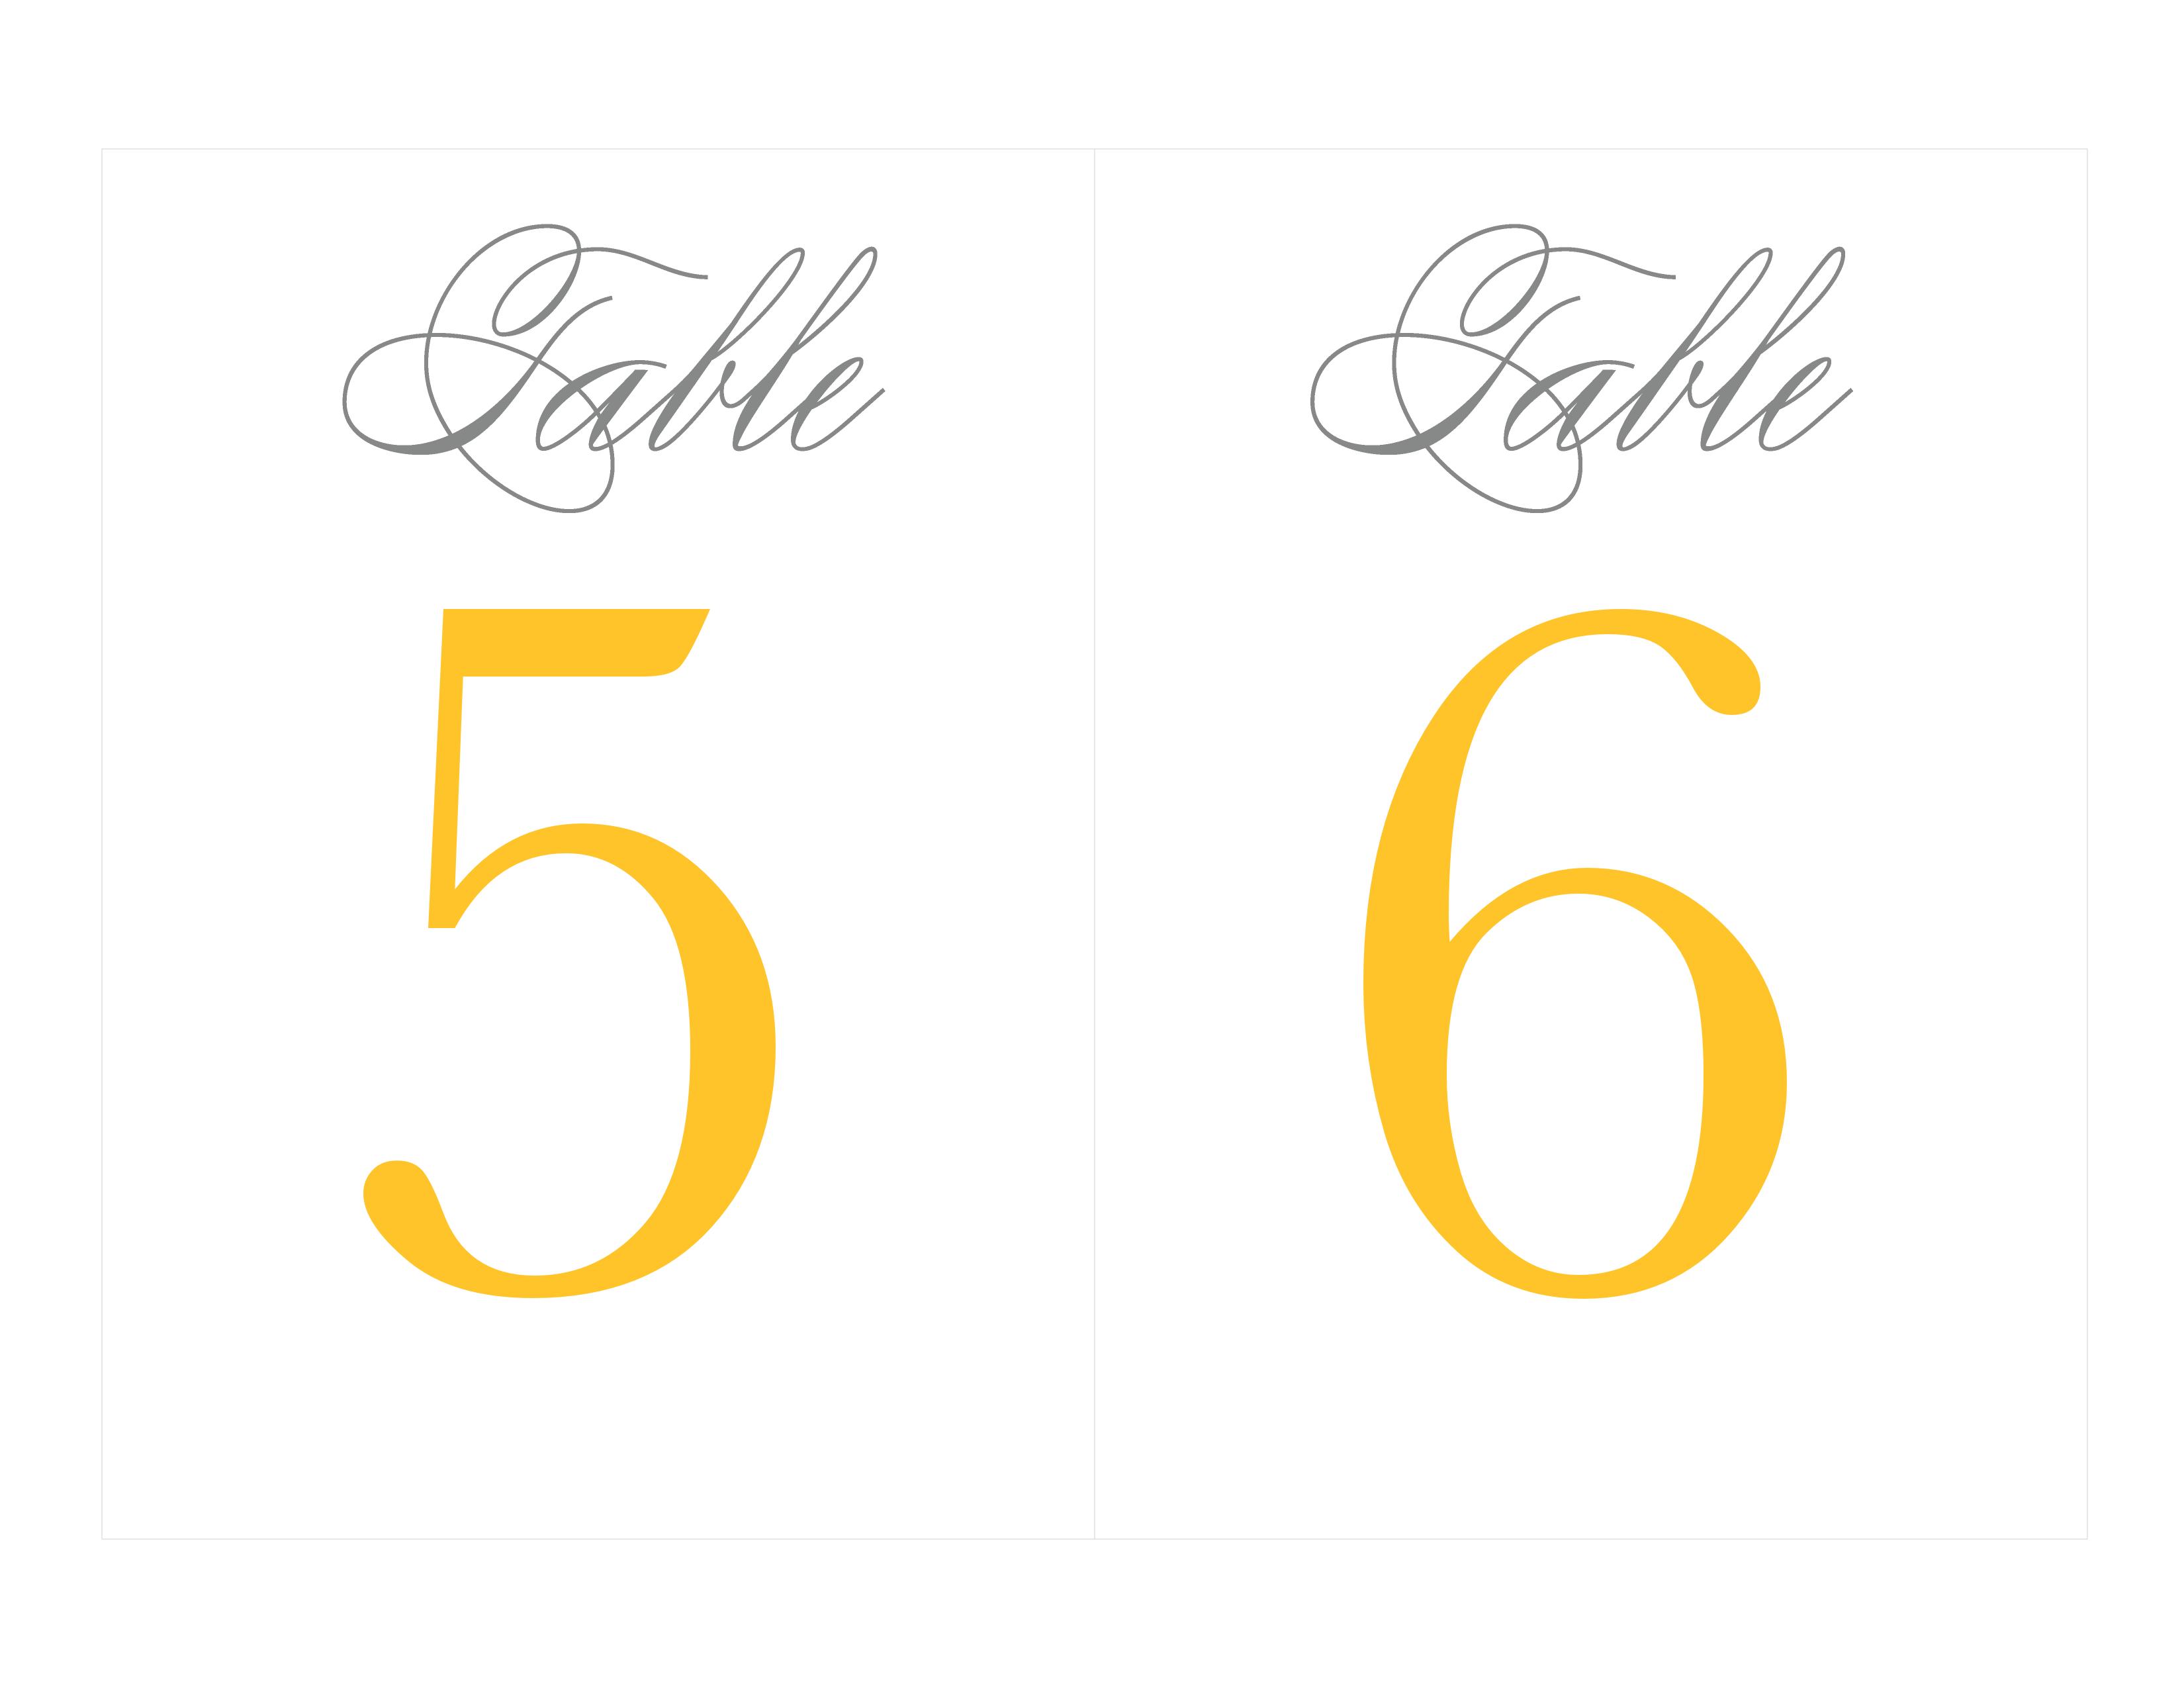 Free Printable Table Numbers   Wedding Ideas - Grey & Yellow - Free Printable Table Numbers 1 20